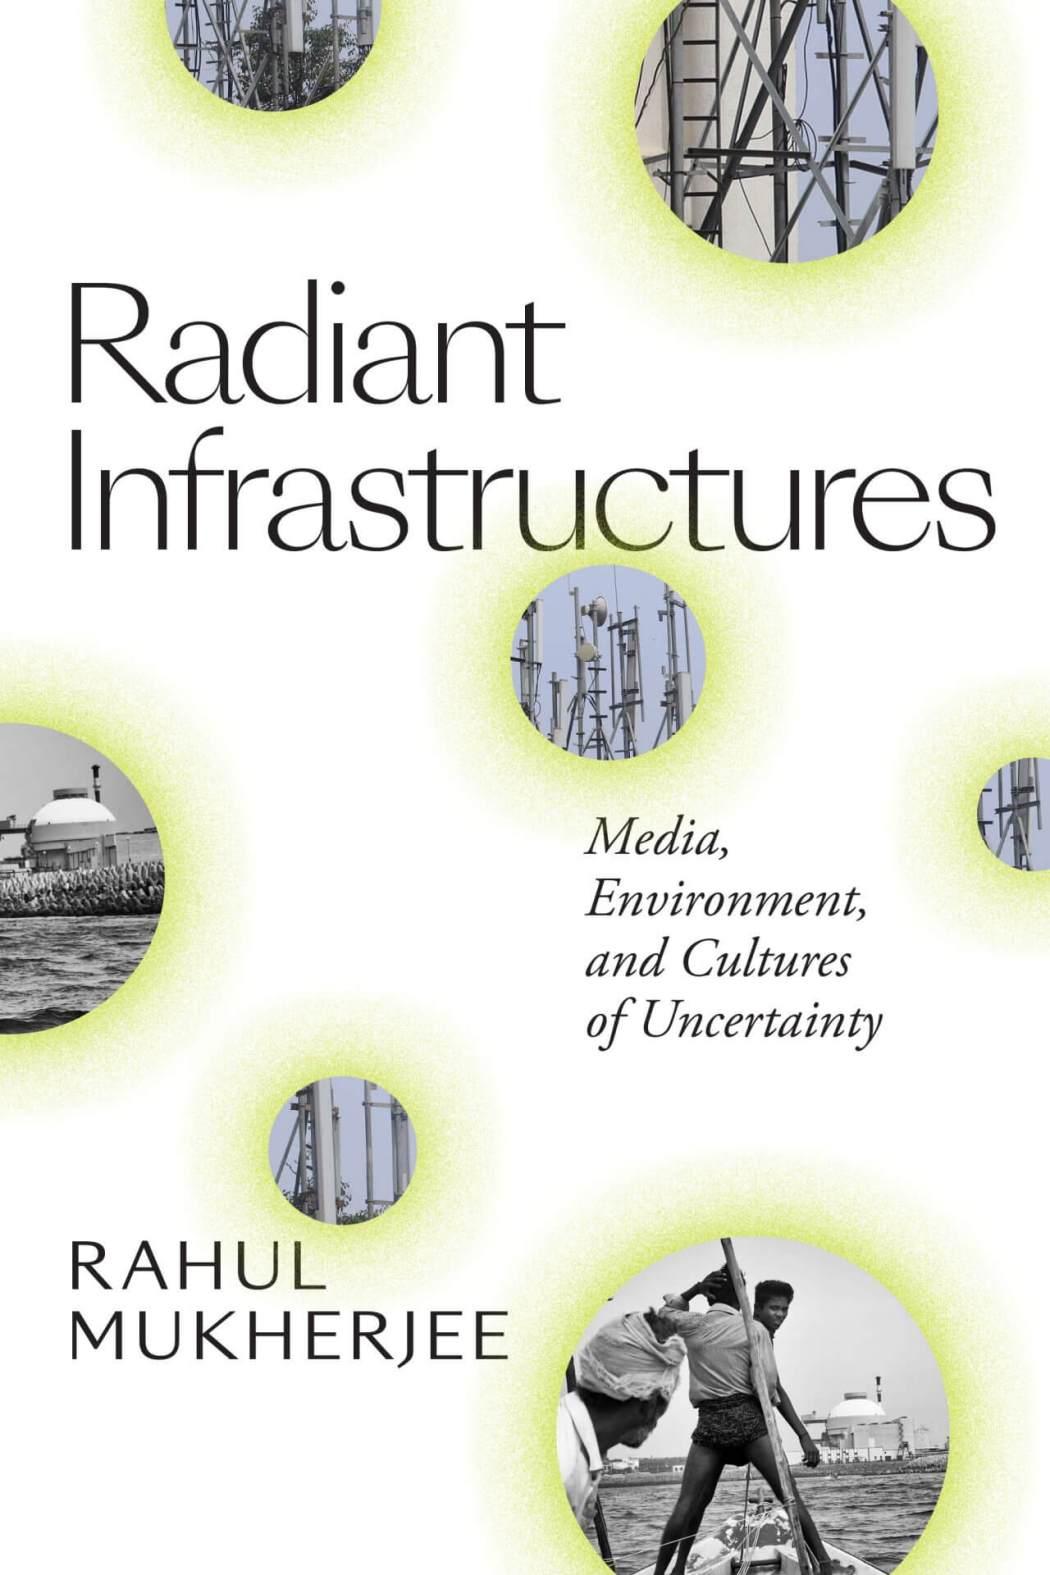 Mediapolis Q&A: Rahul Mukherjee's Radiant Infrastructures